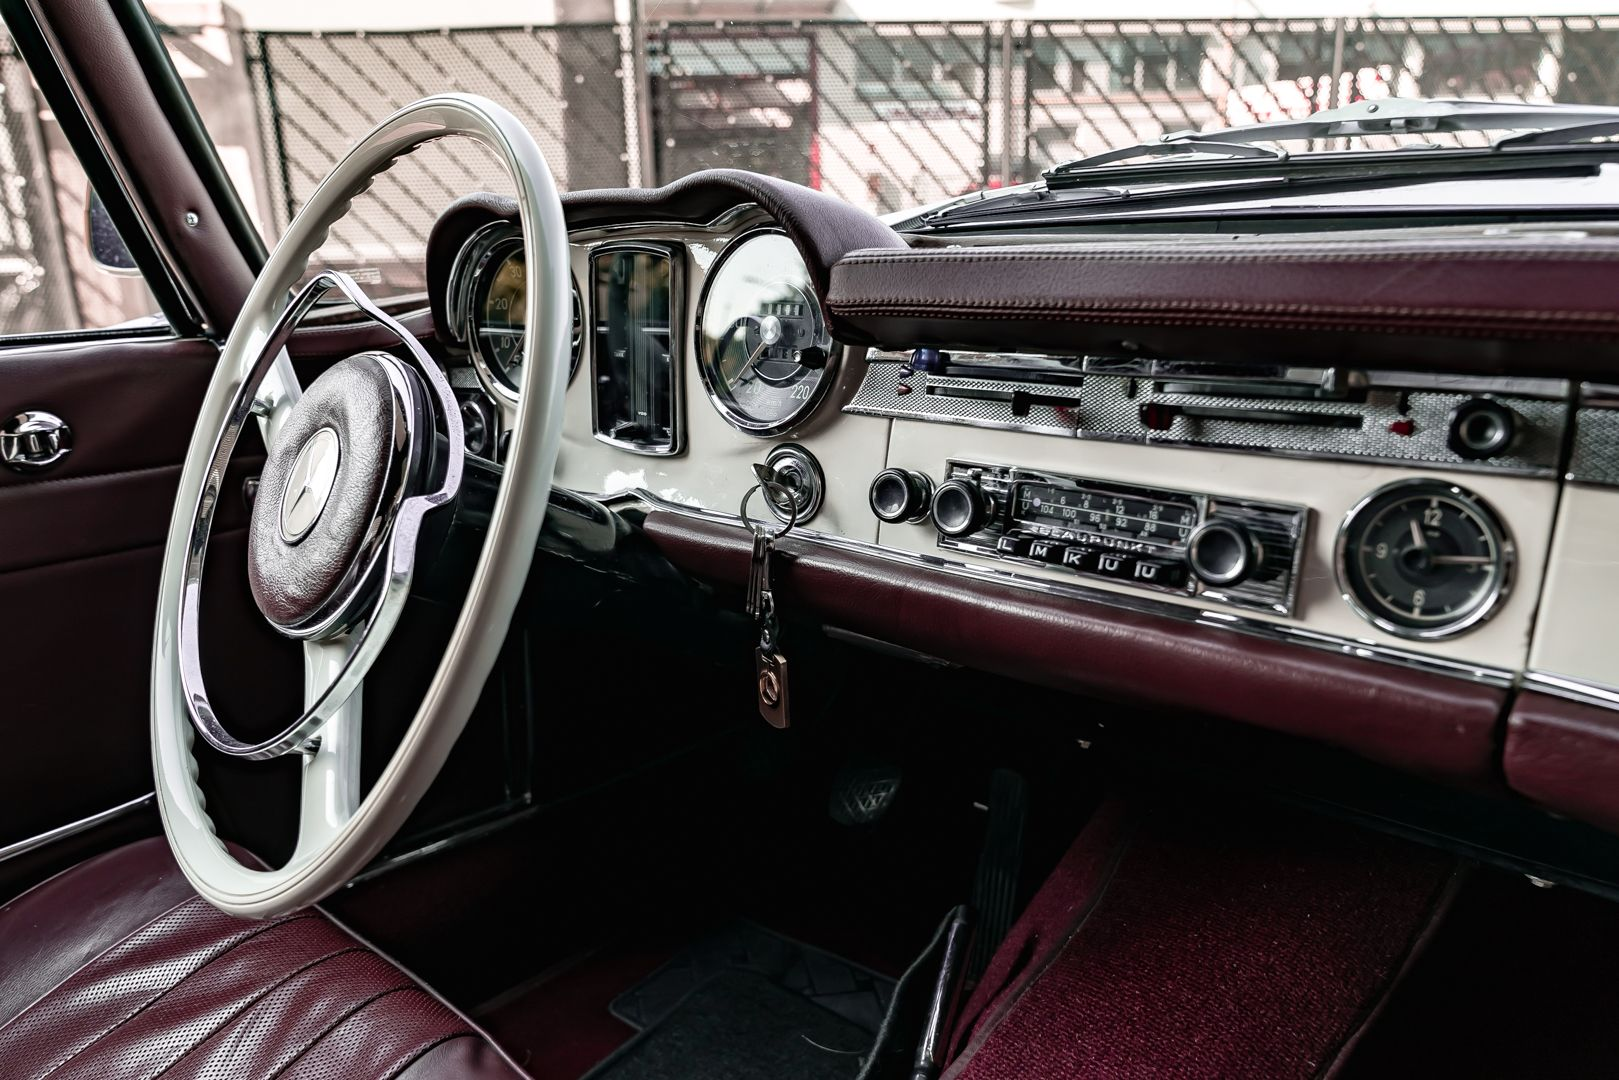 1965 Mercedes-Benz SL230 Pagoda 78543